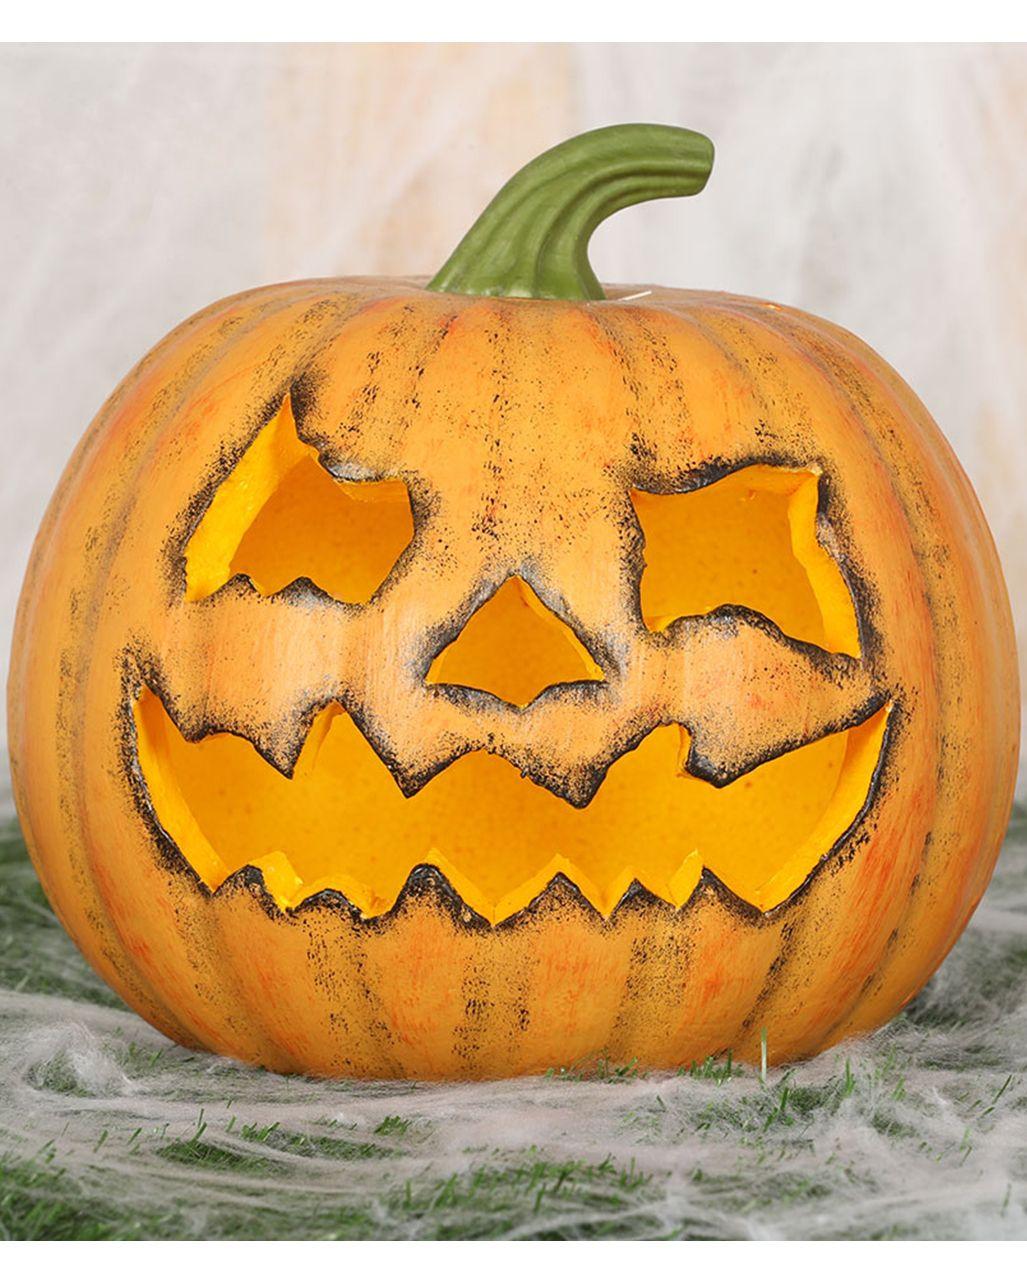 Deko Kurbis Halloween 20cm Pumpkin Kaufen Horror Shop Com Halloween Deko Figuren Halloween Figuren Halloween